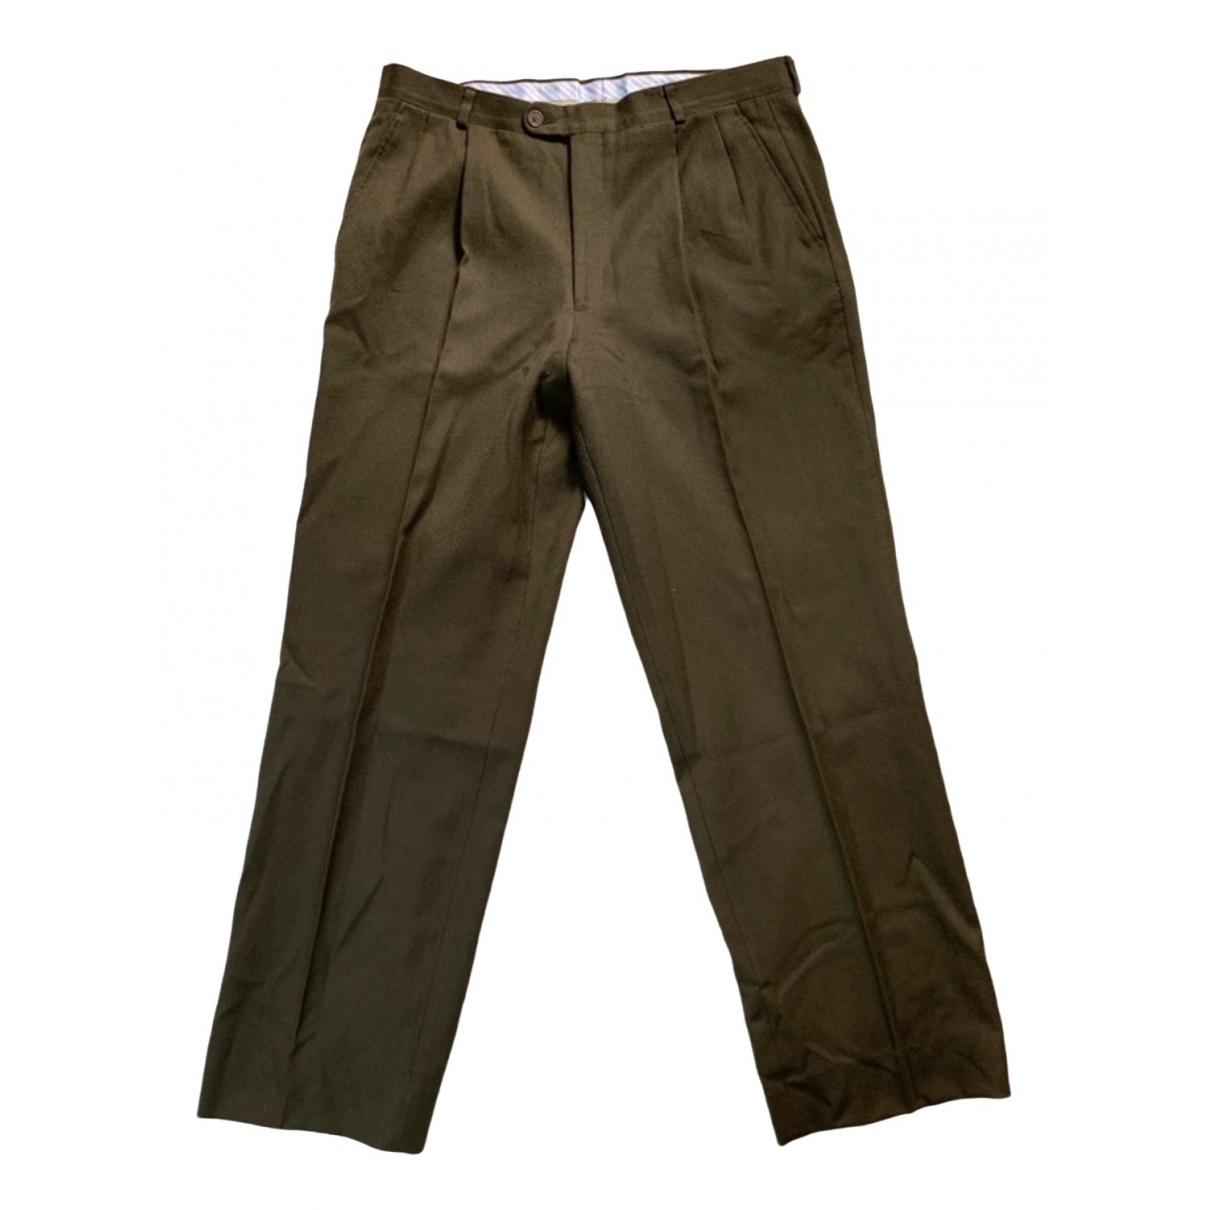 Yves Saint Laurent \N Khaki Wool Trousers for Men XL International